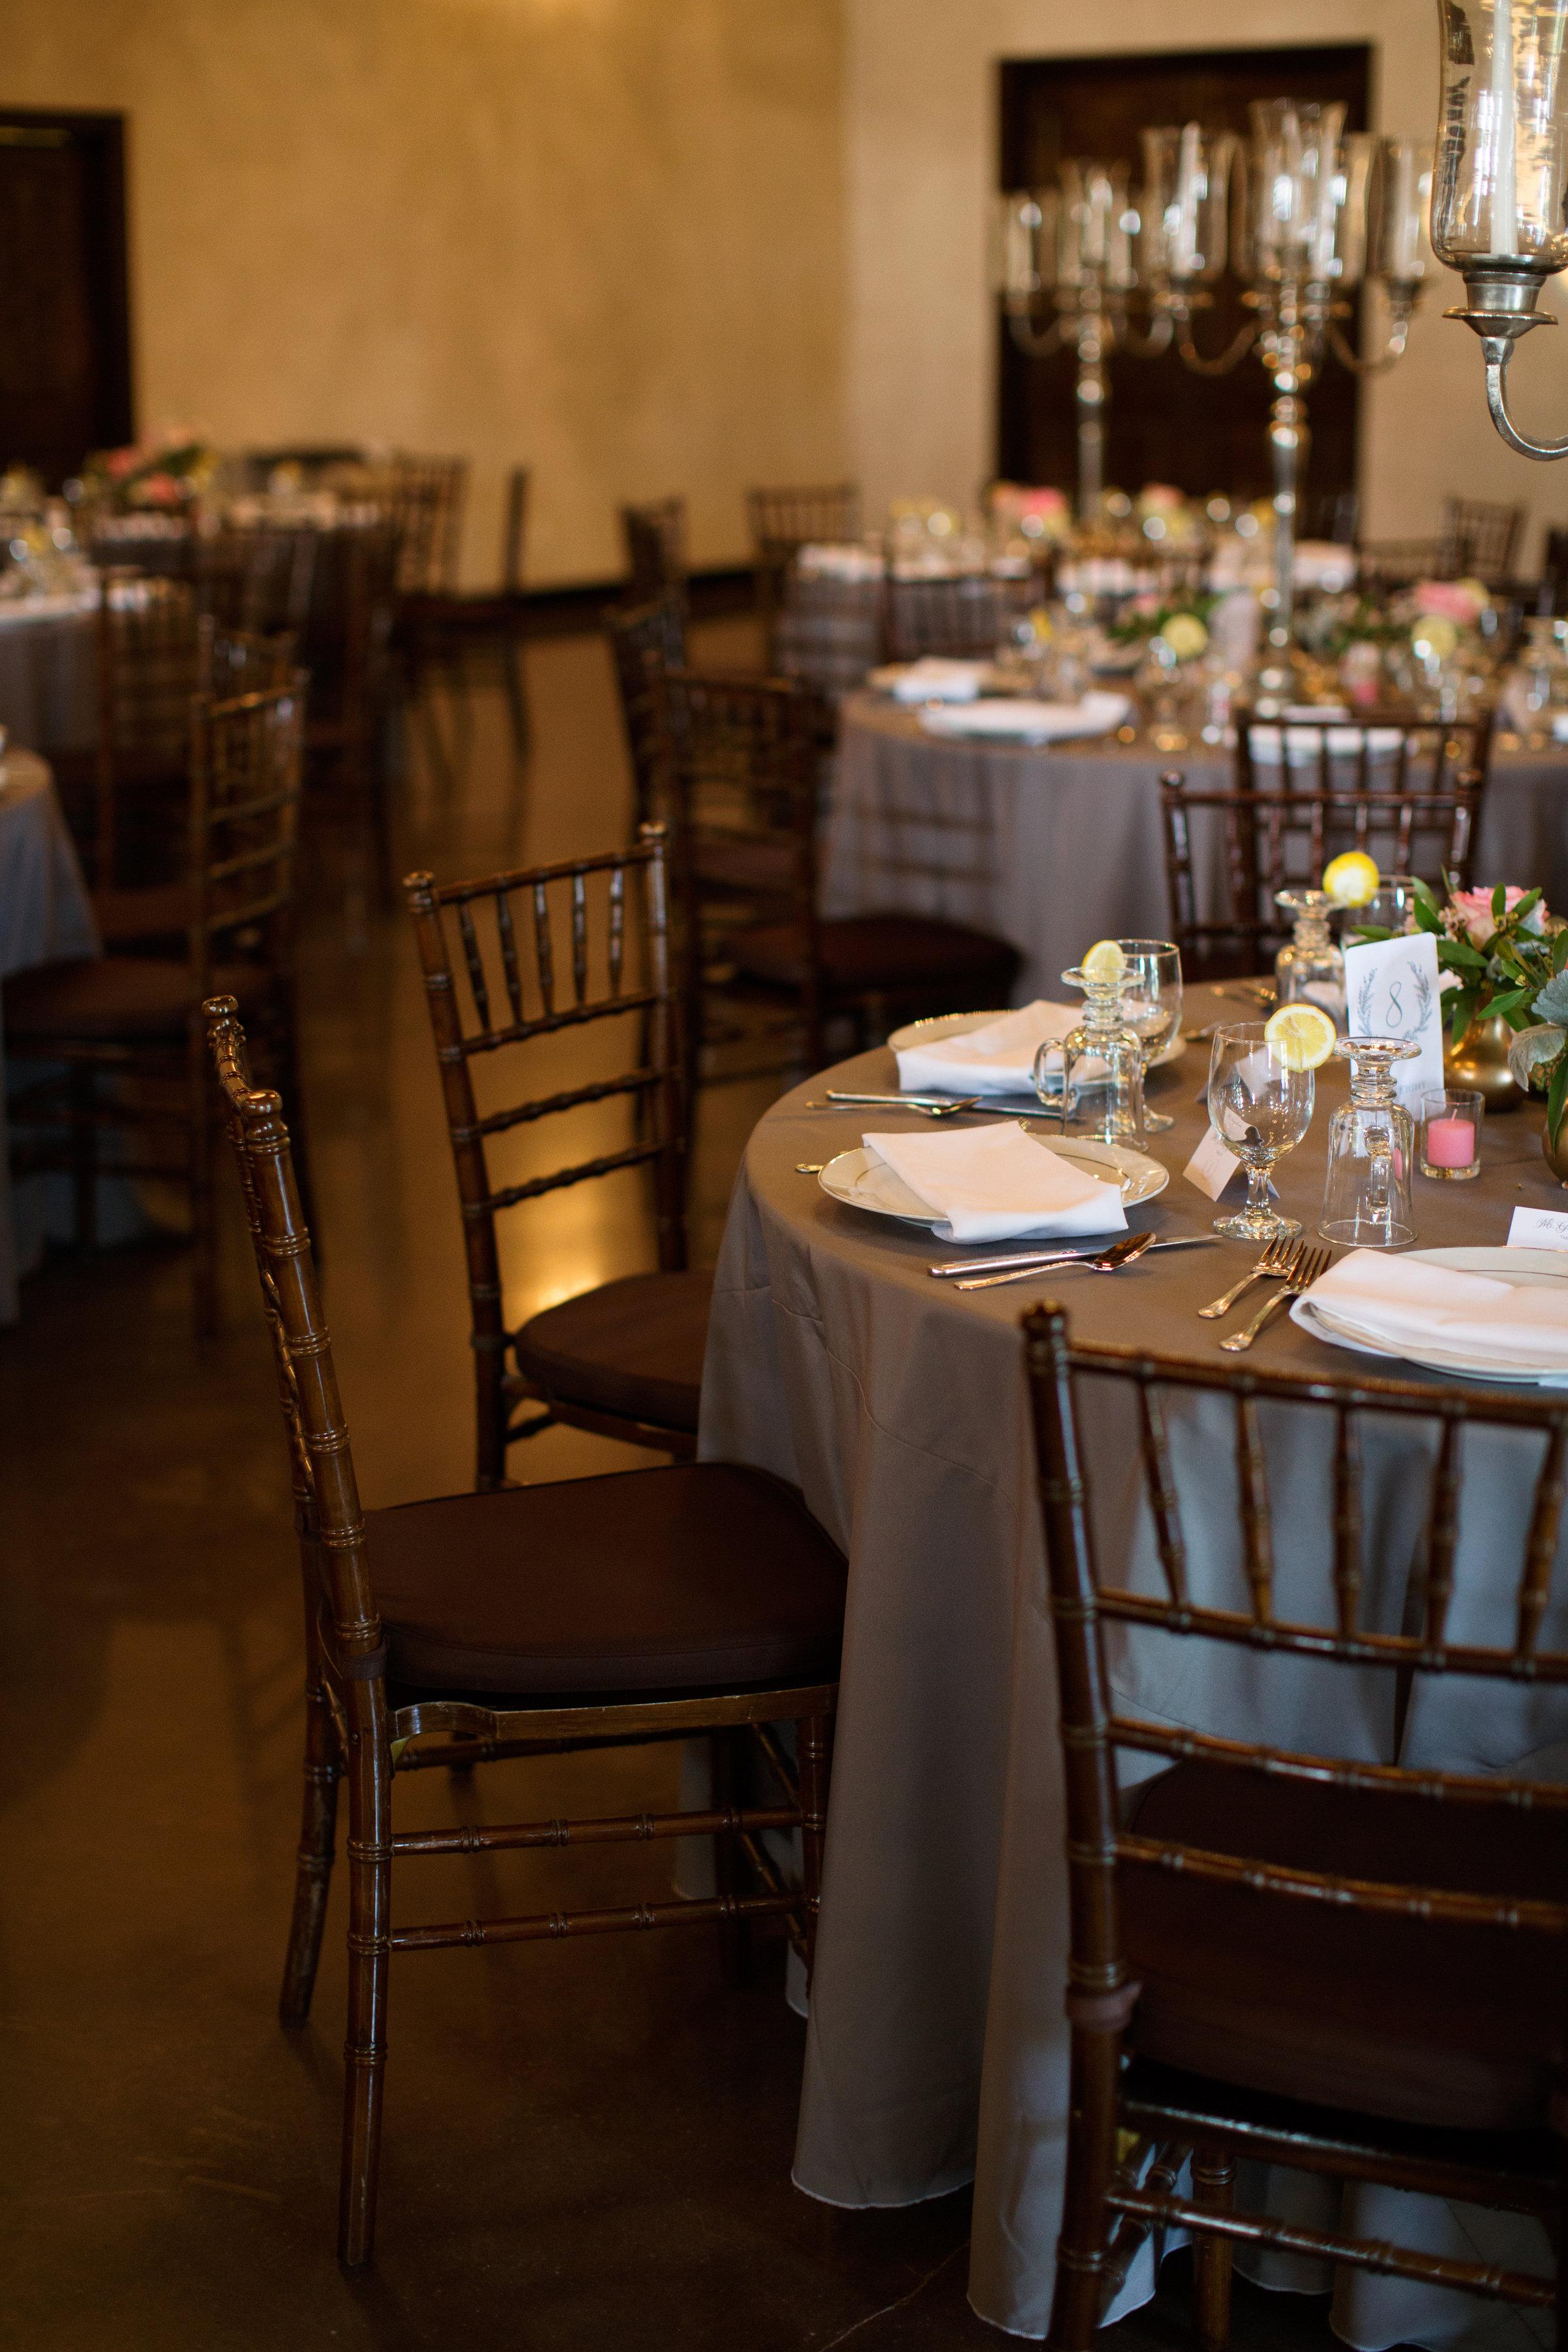 Ma Maison Austin Wedding Venue_ Austin Wedding Planner Heavenly Day Events _ Kristi Wright Austin Wedding Photographer20160306_0165.JPG